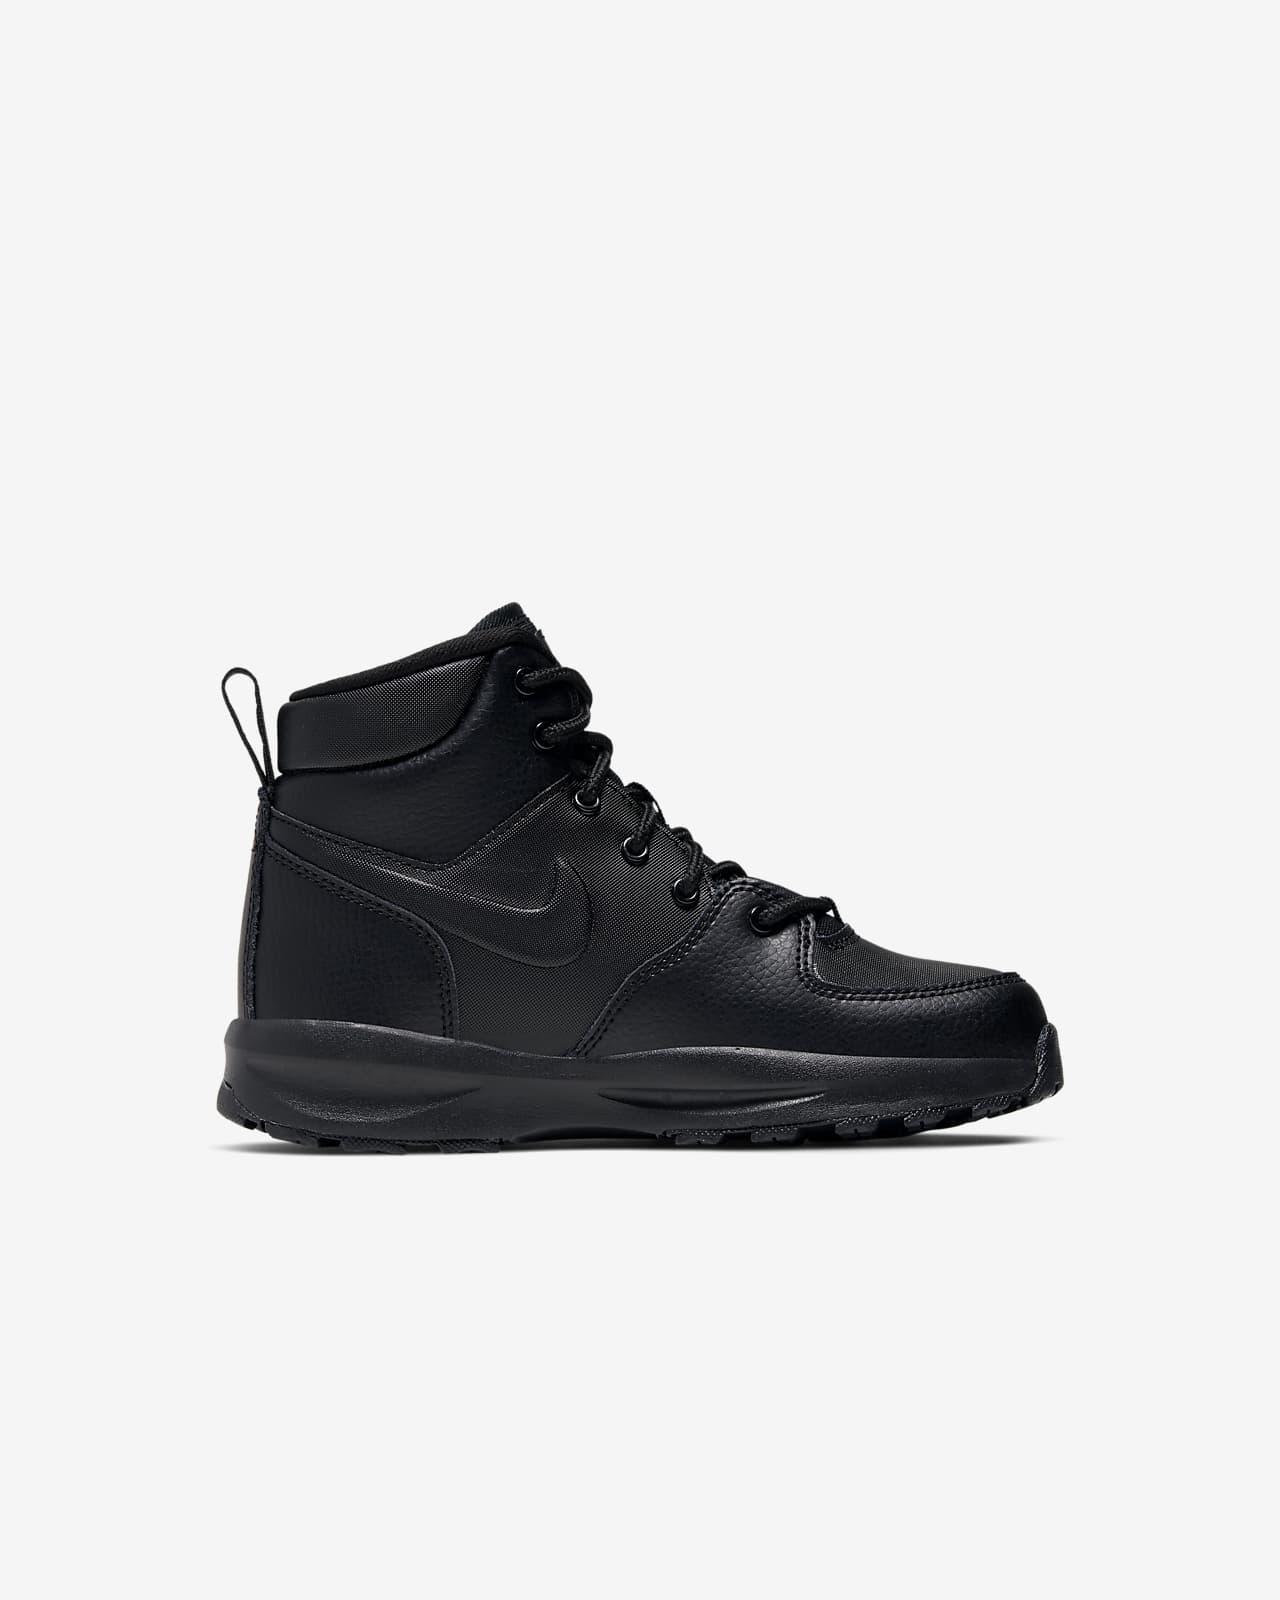 Nike Manoa Younger Kids' Boot. Nike SA